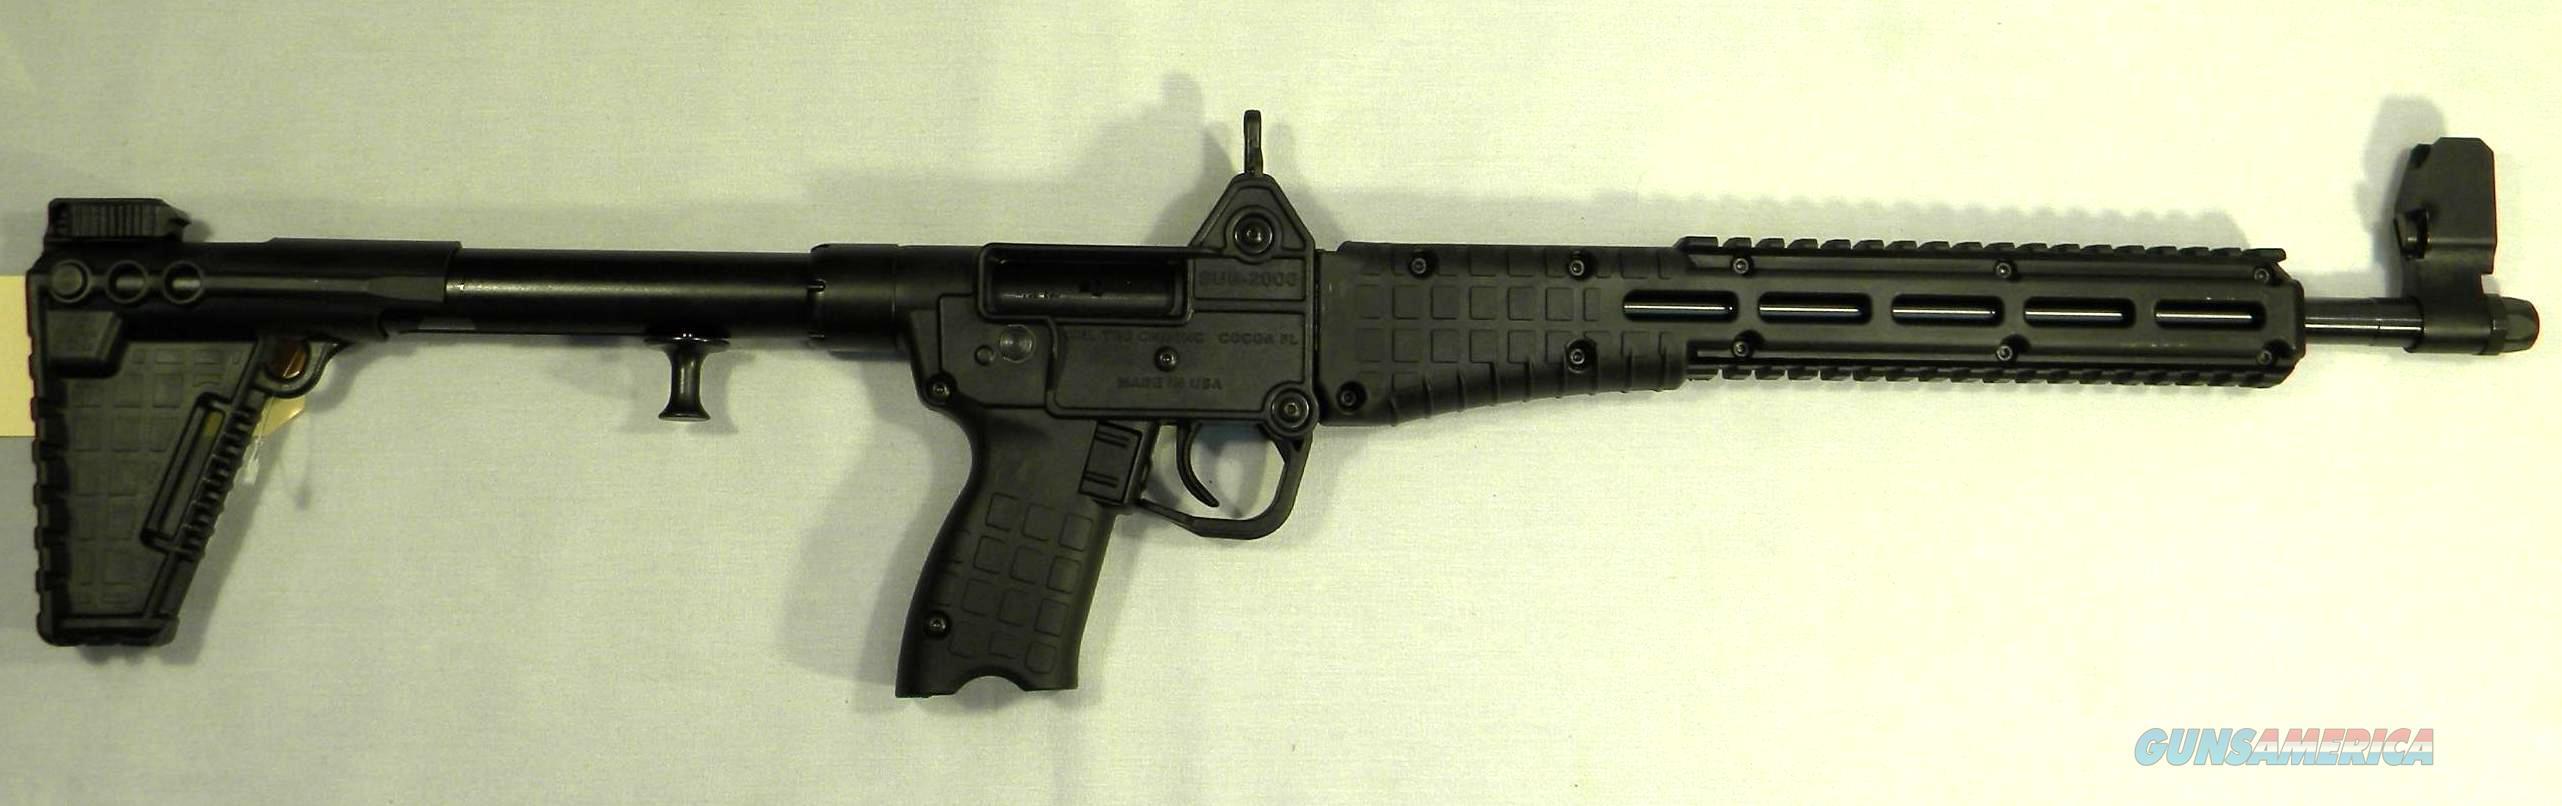 Kel-Tec Sub 2000, .40S&W, Uses Full-Sized Glock Magazines!  Guns > Rifles > Kel-Tec Rifles